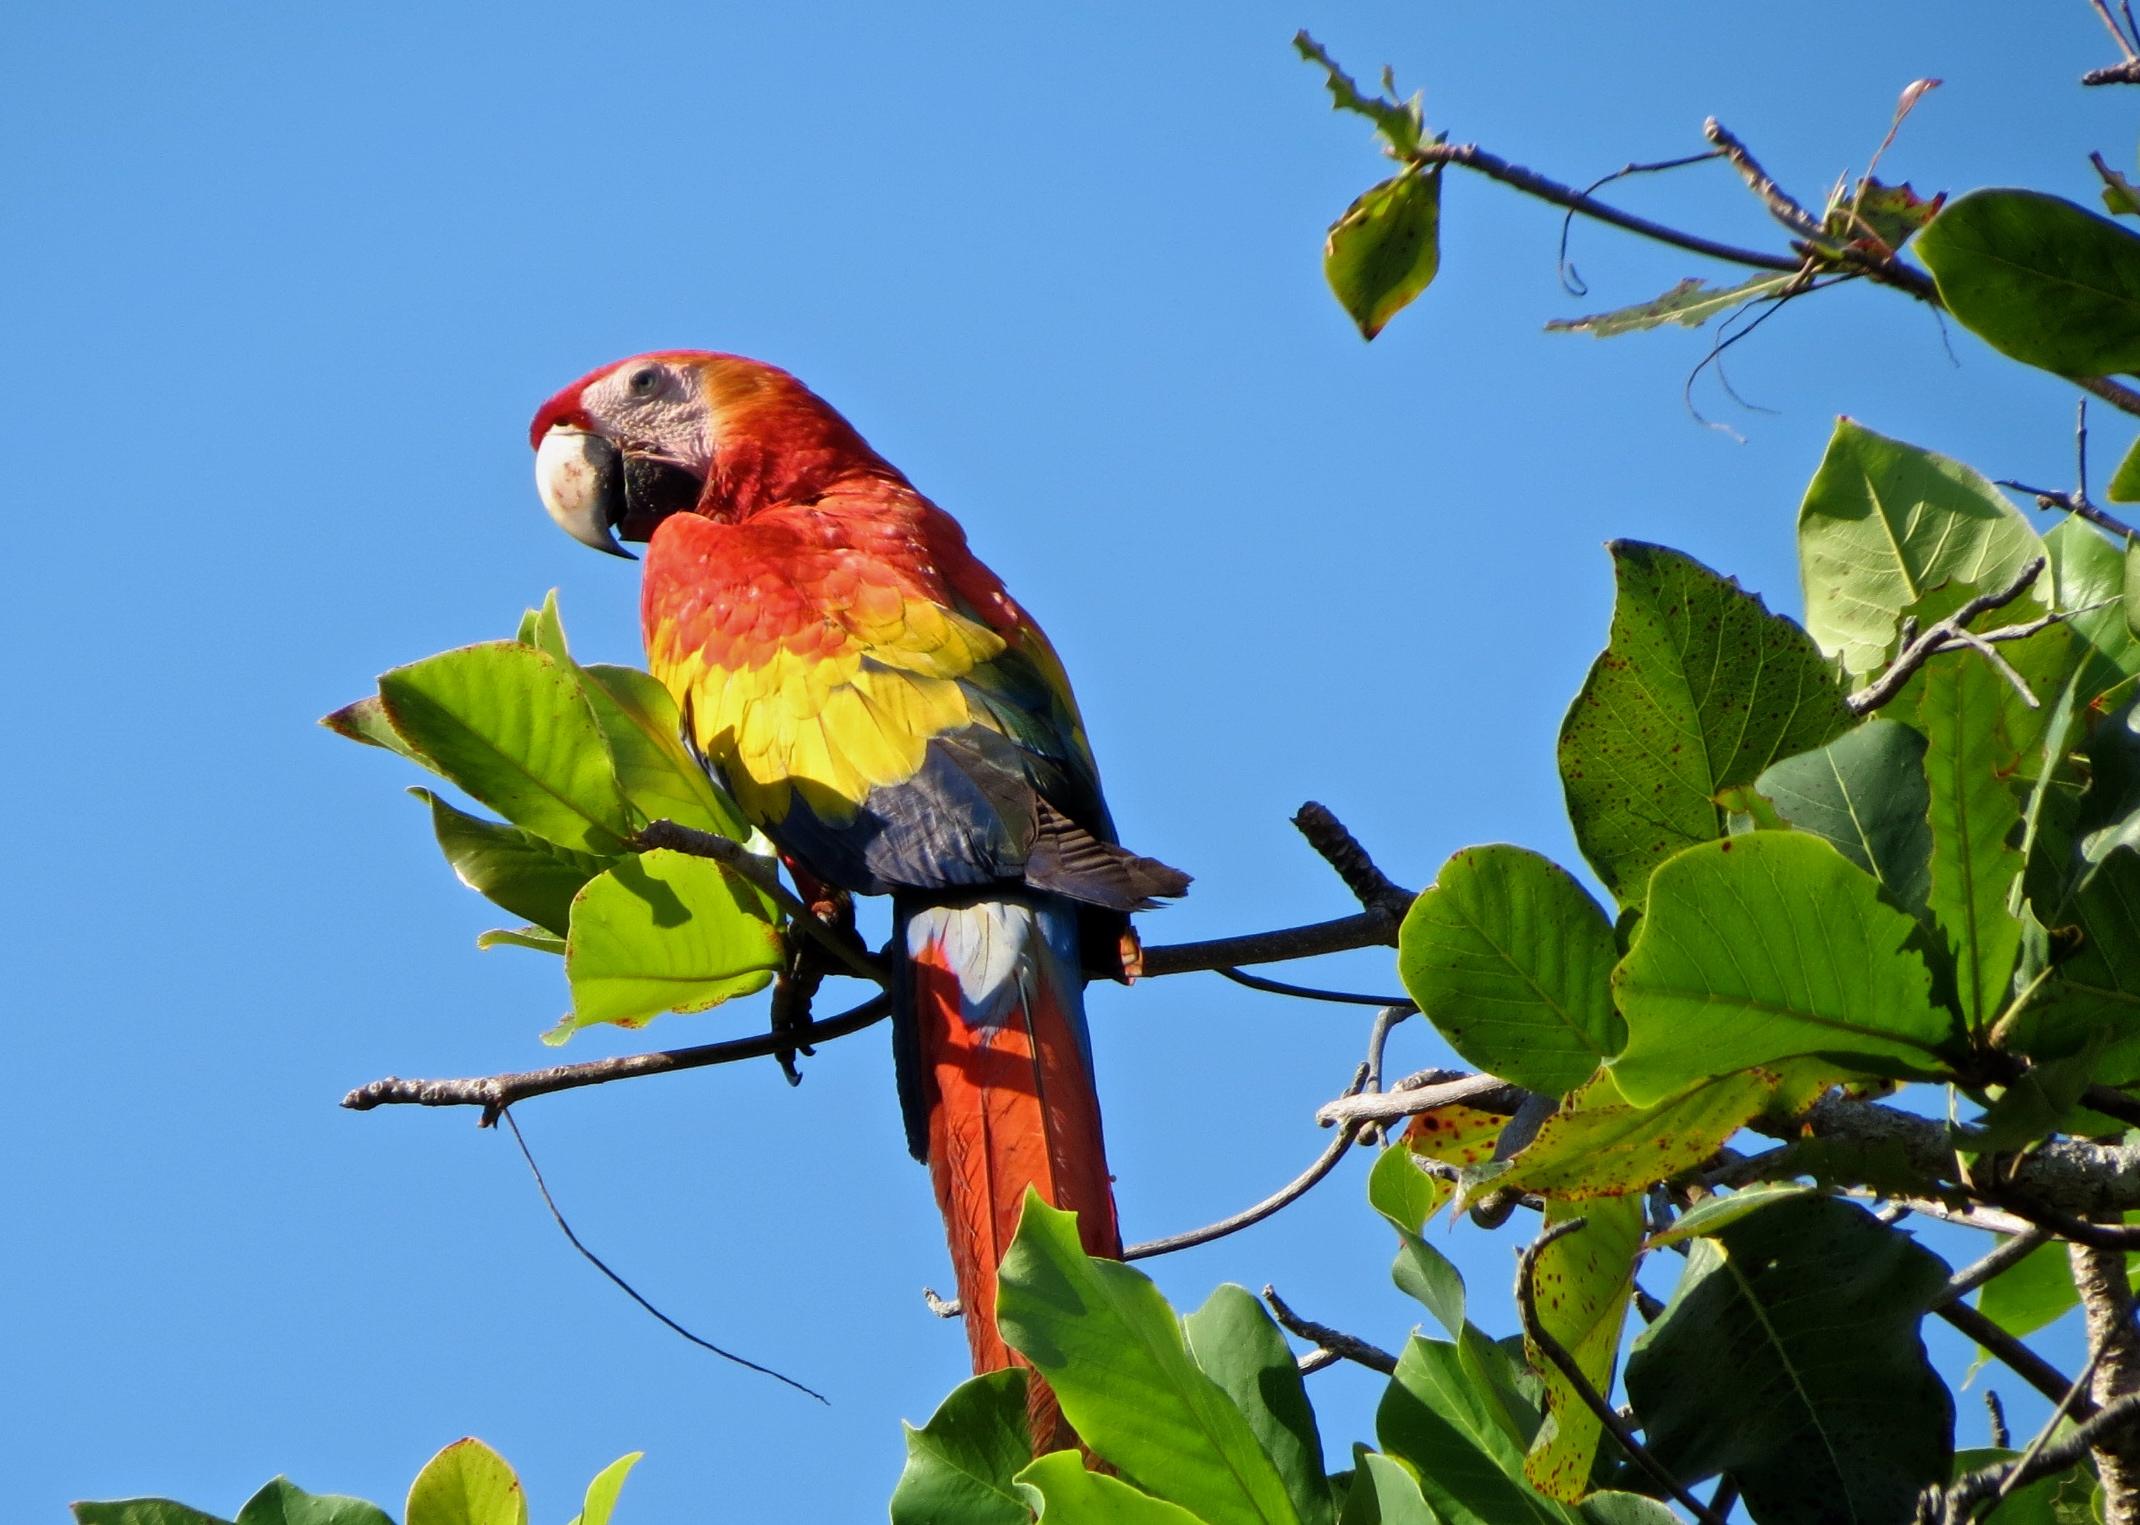 Summer Program - Wildlife Conservation | CIEE High School Summer Abroad: Tropical Biodiversity Conservation in Monteverde, Costa Rica